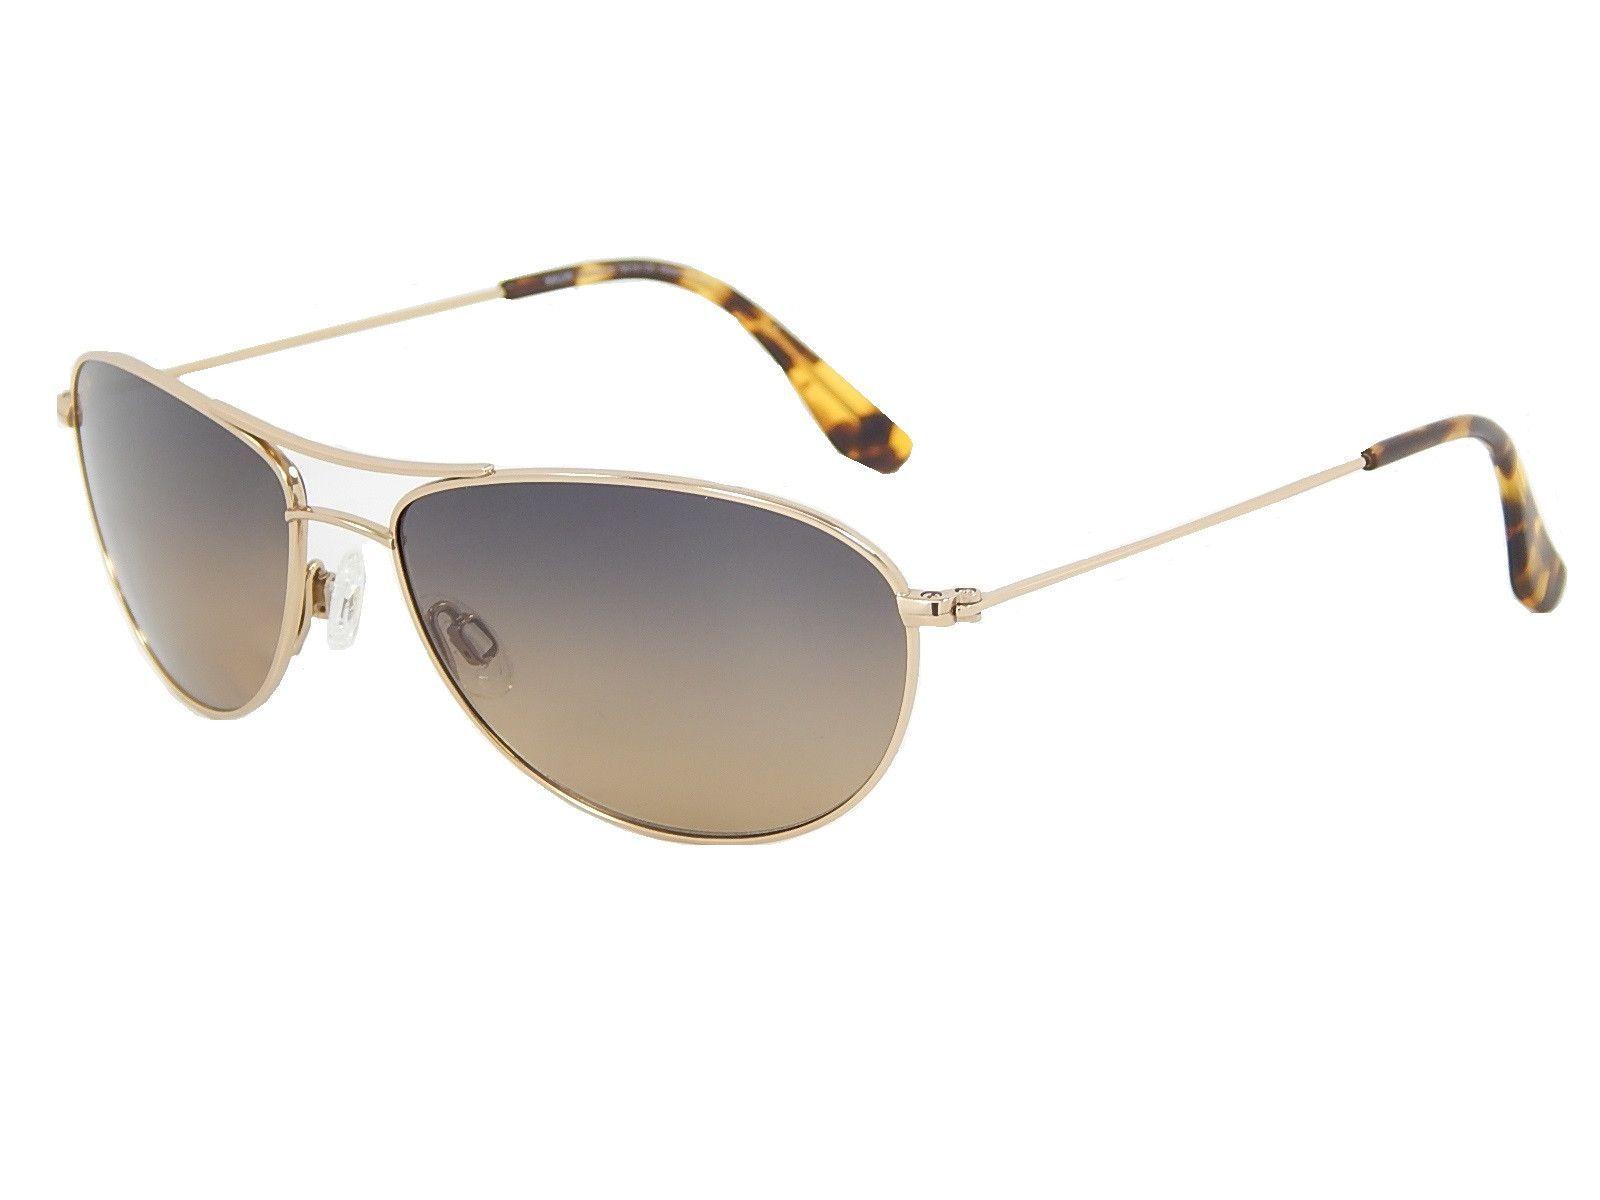 ddca3959ada3 Maui Jim Baby Beach HS245-16 Rootbeer HCL Bronze Polarized Sunglasses